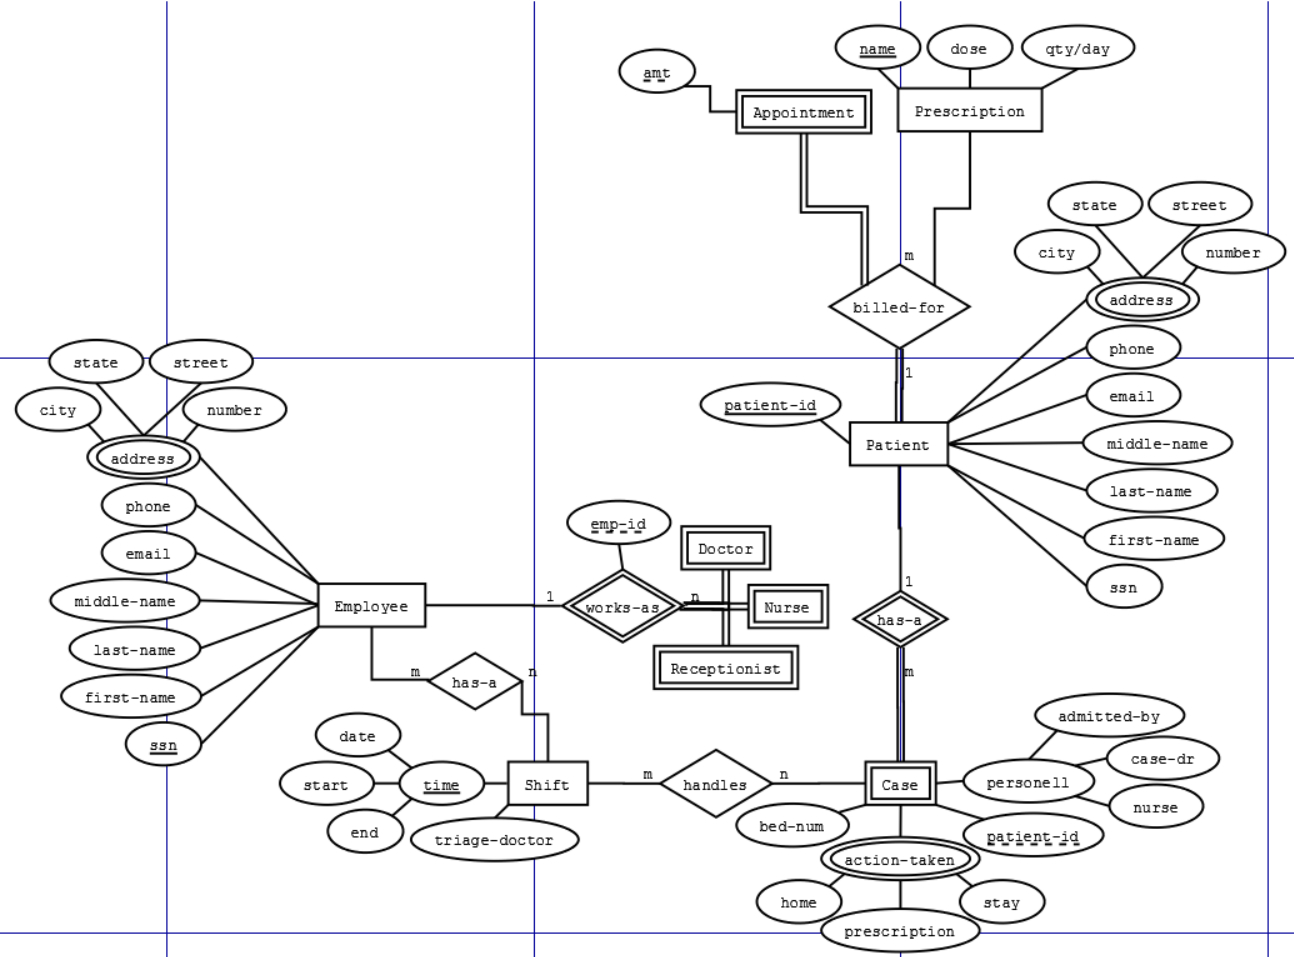 Entity Relationship - Does This Er Schema Make Sense - Stack intended for Er Schema